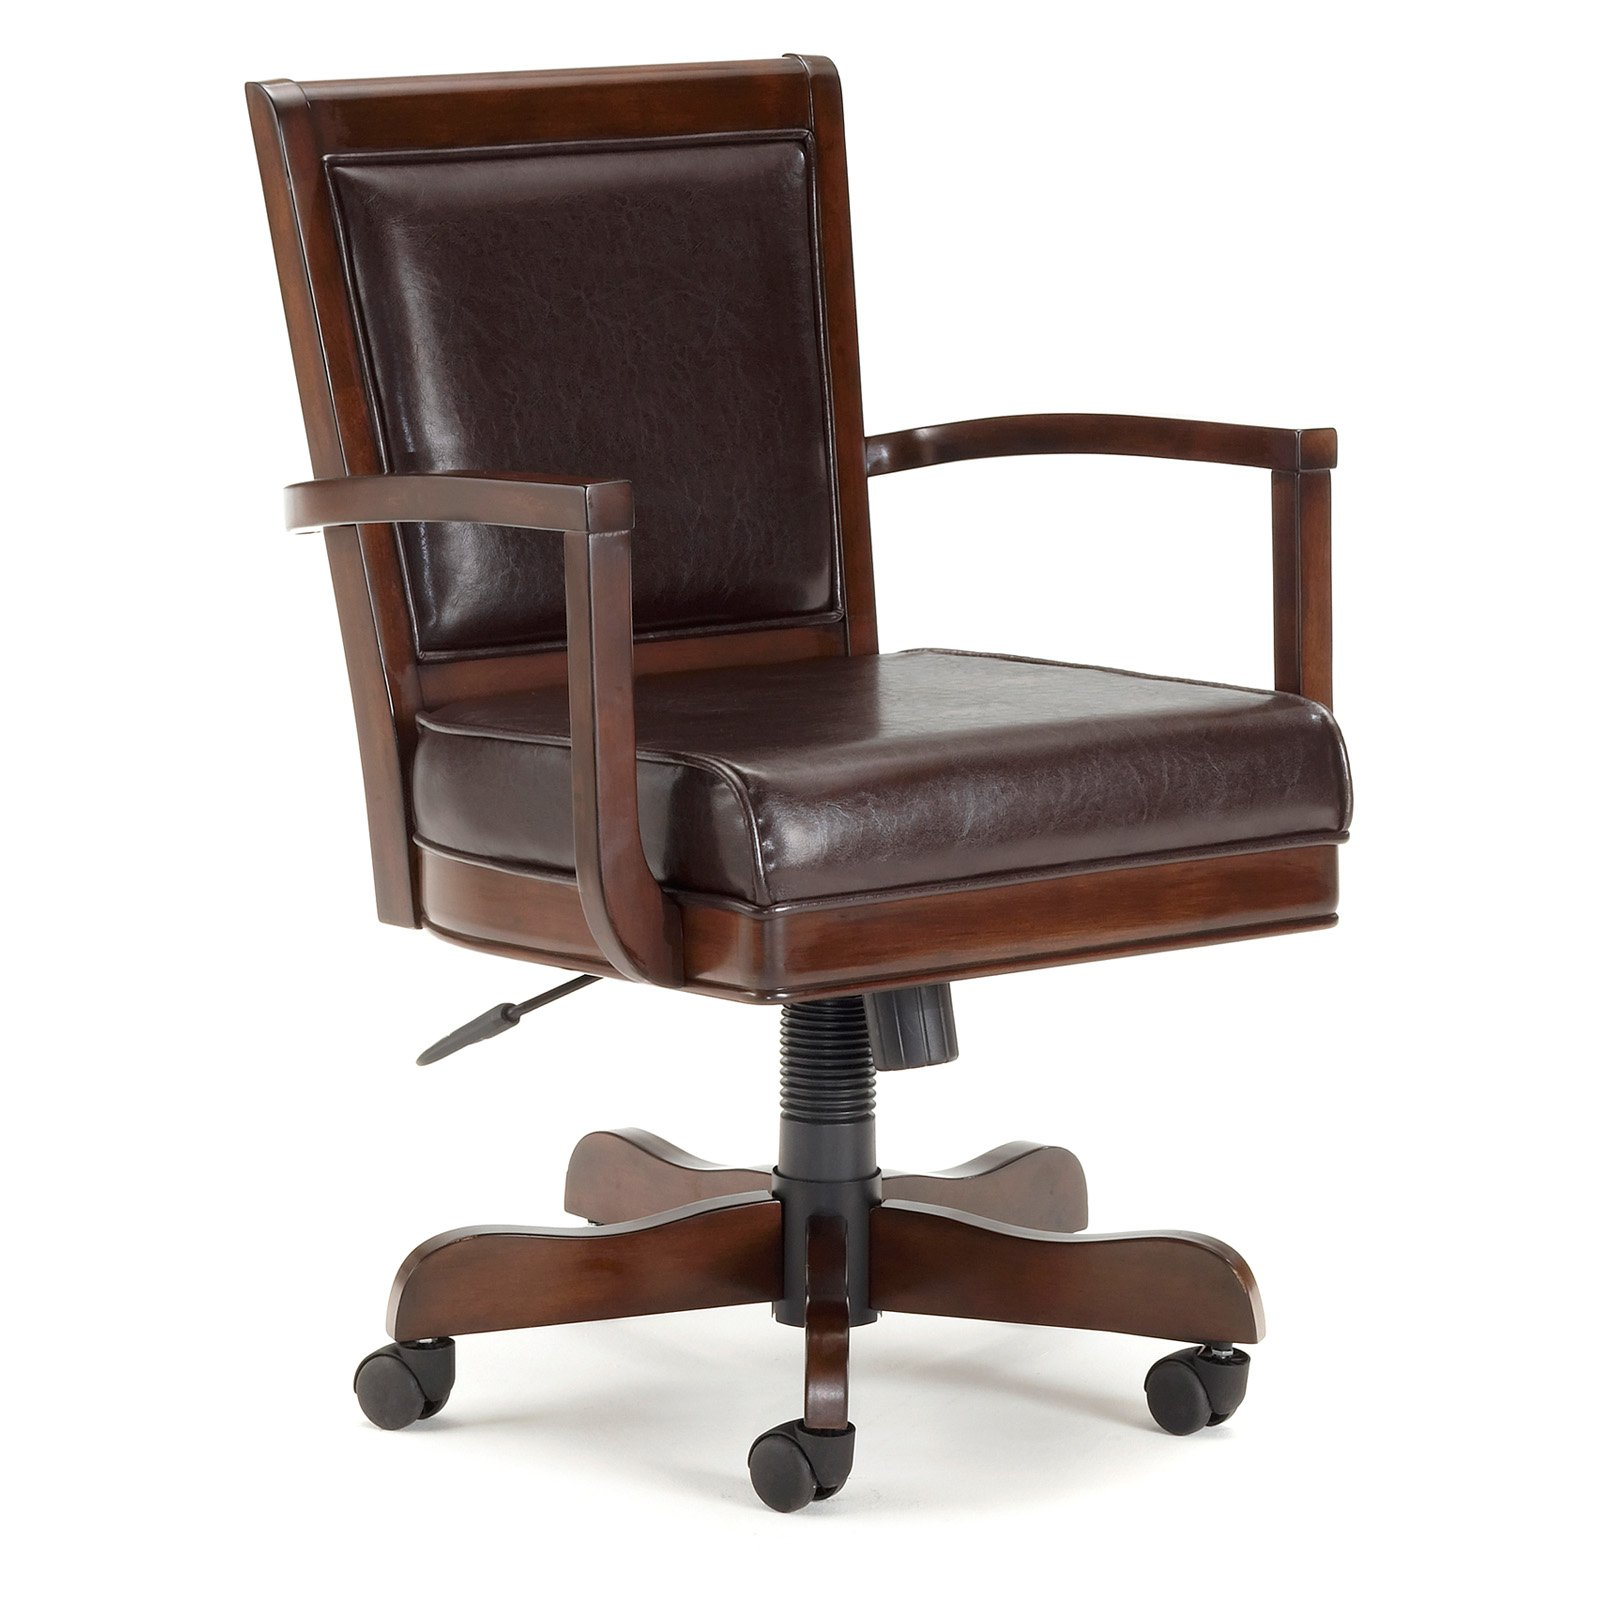 Hillsdale Ambassador Caster Game Chair